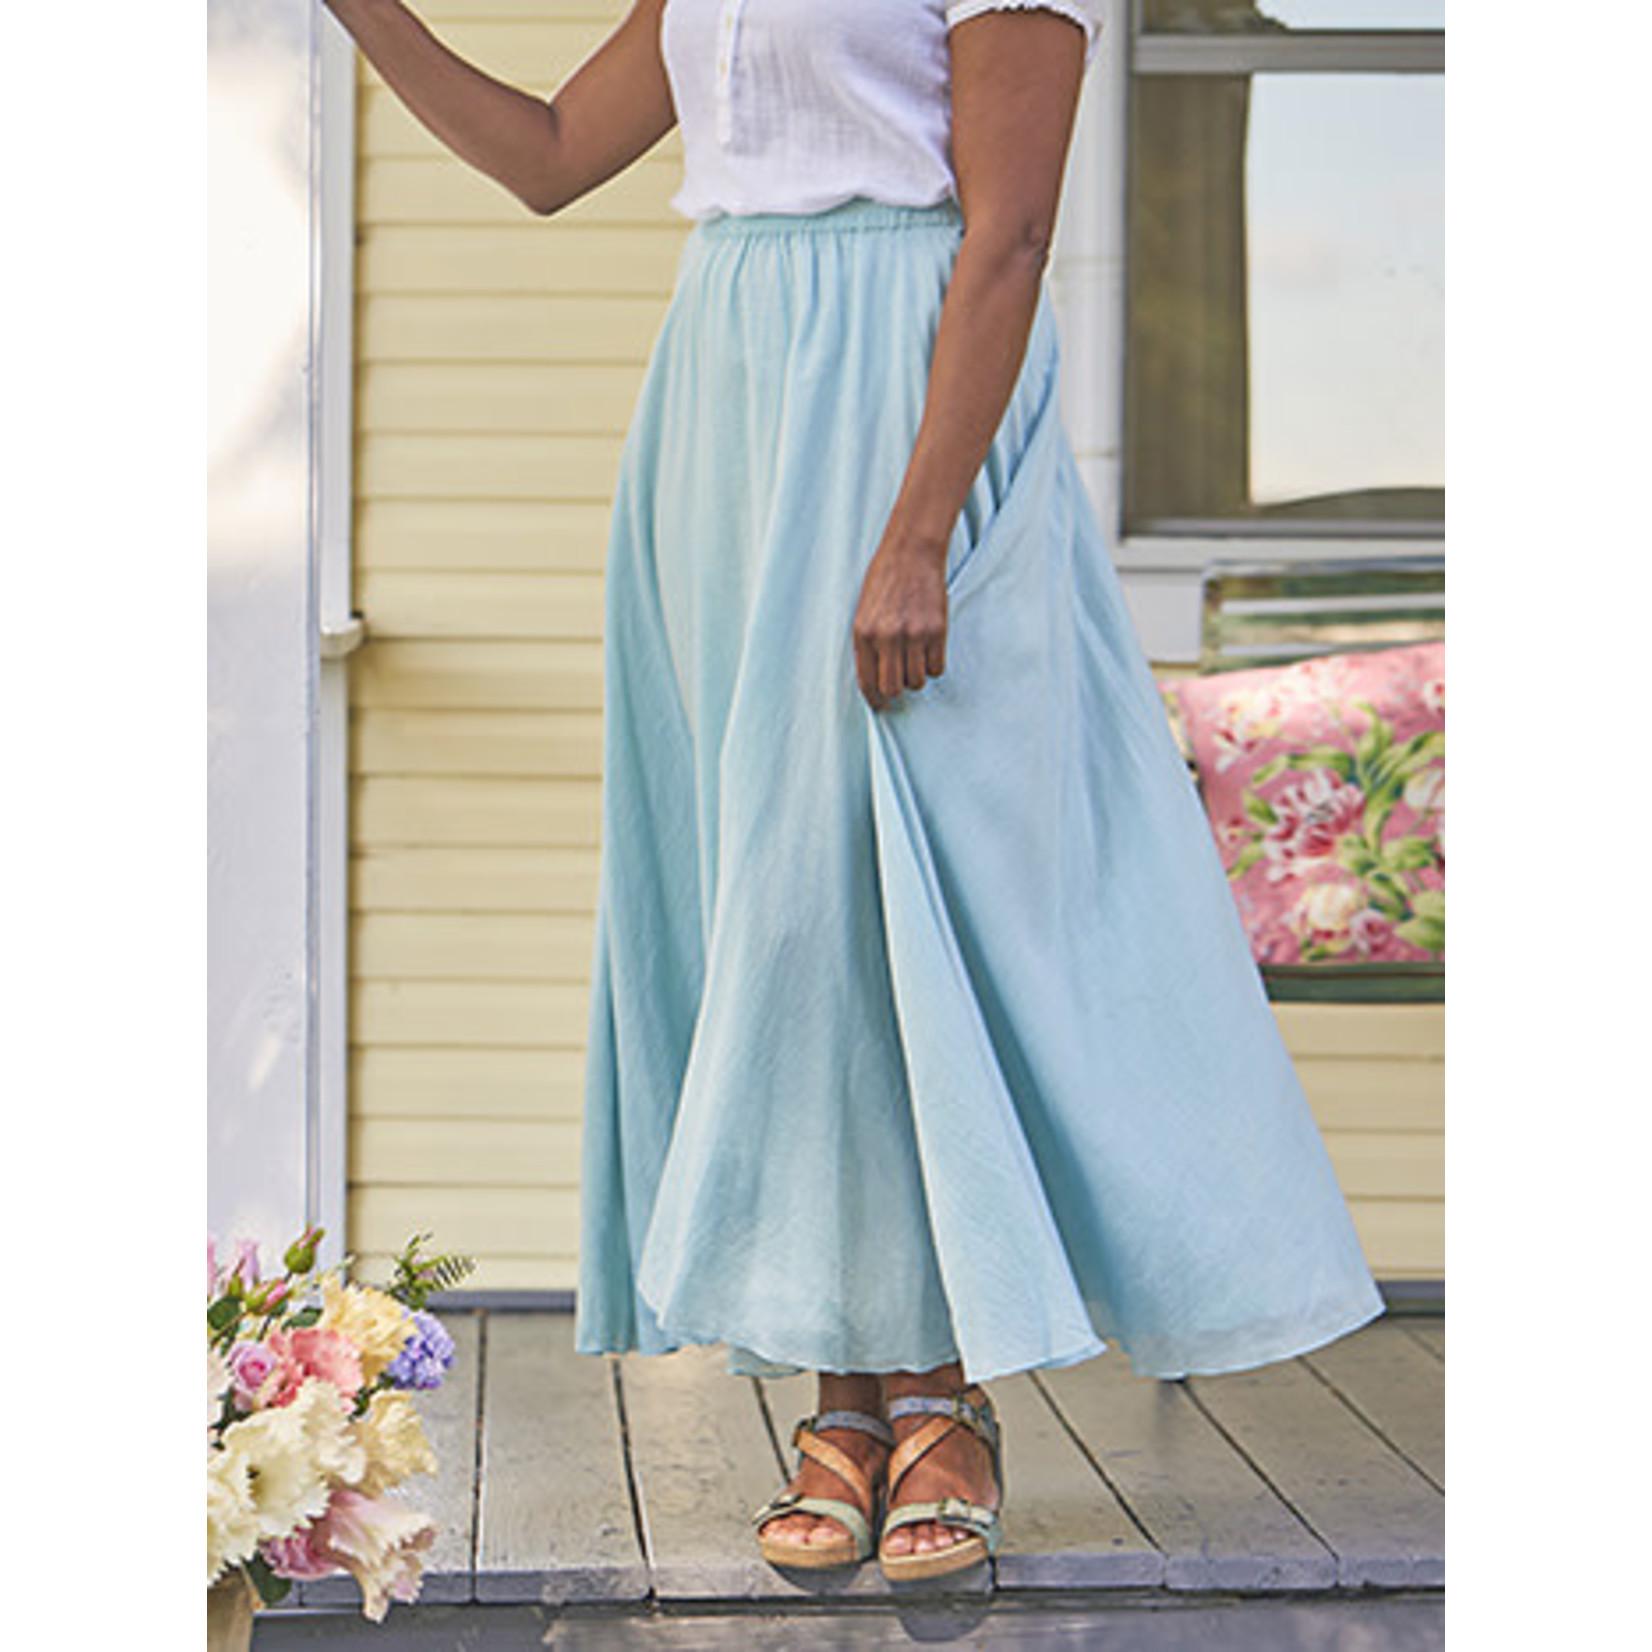 April Cornell April Cornell Paradise Skirt